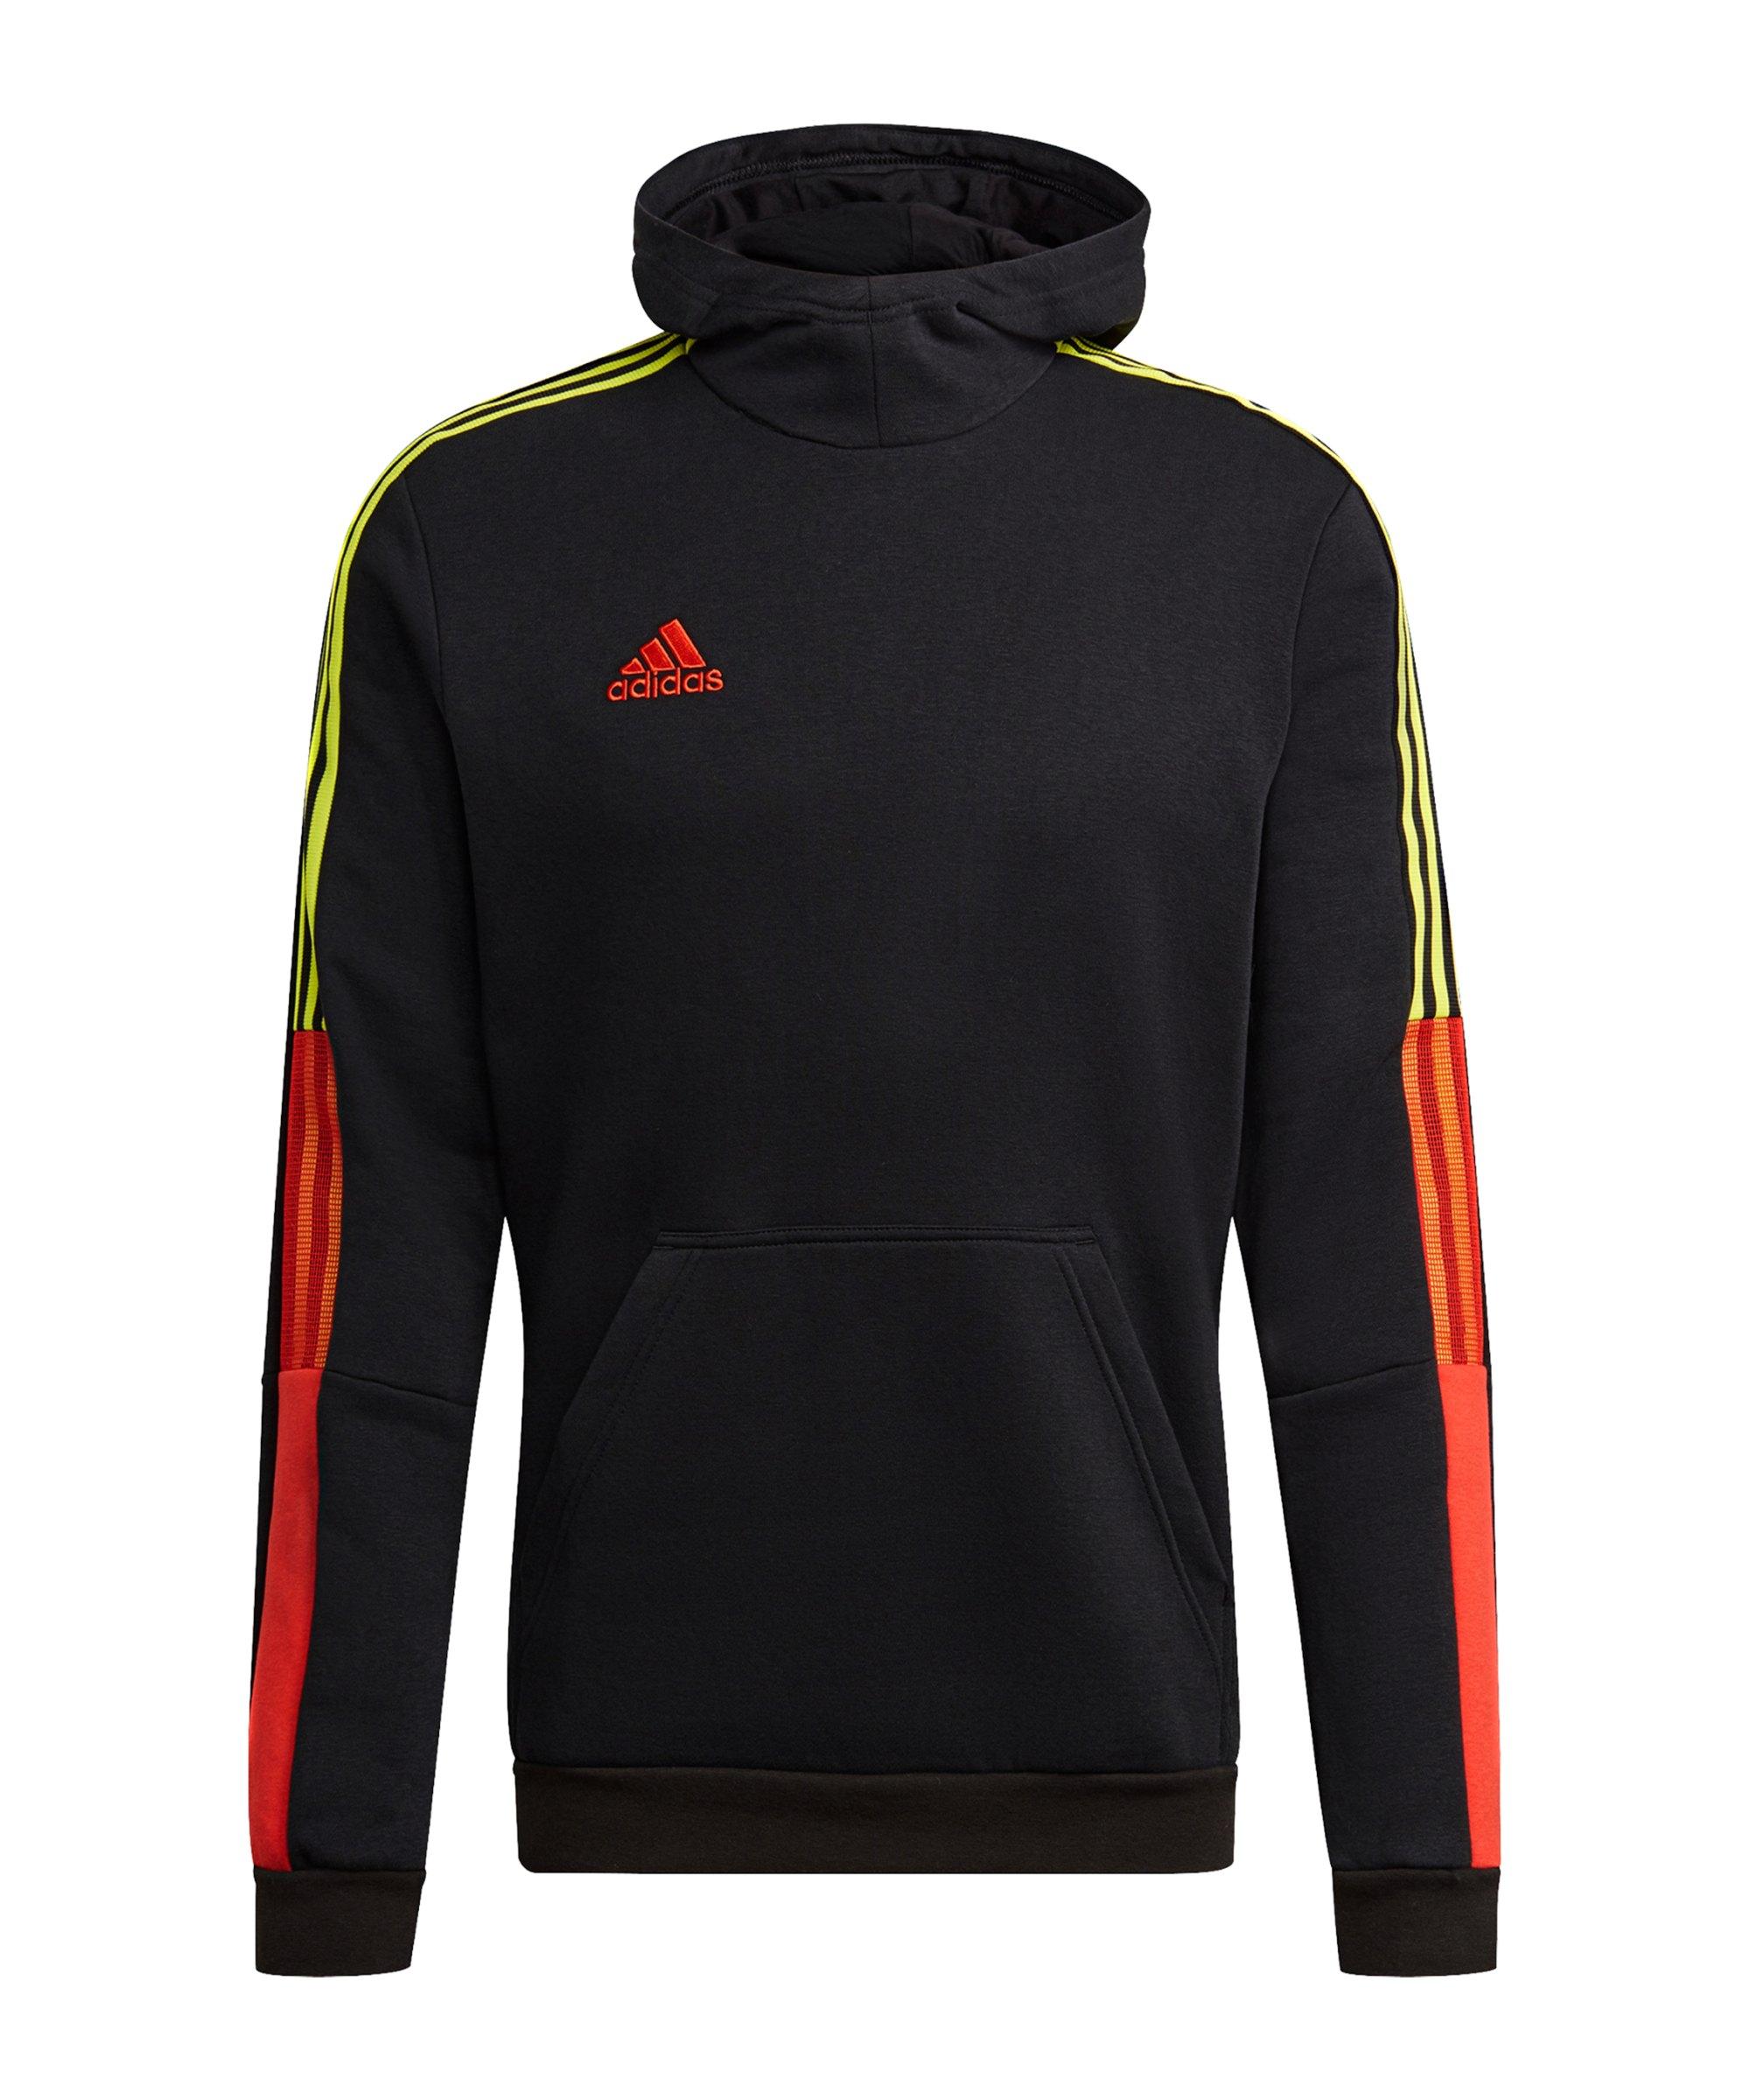 adidas Tiro Hoody Schwarz Rot Gelb - schwarz